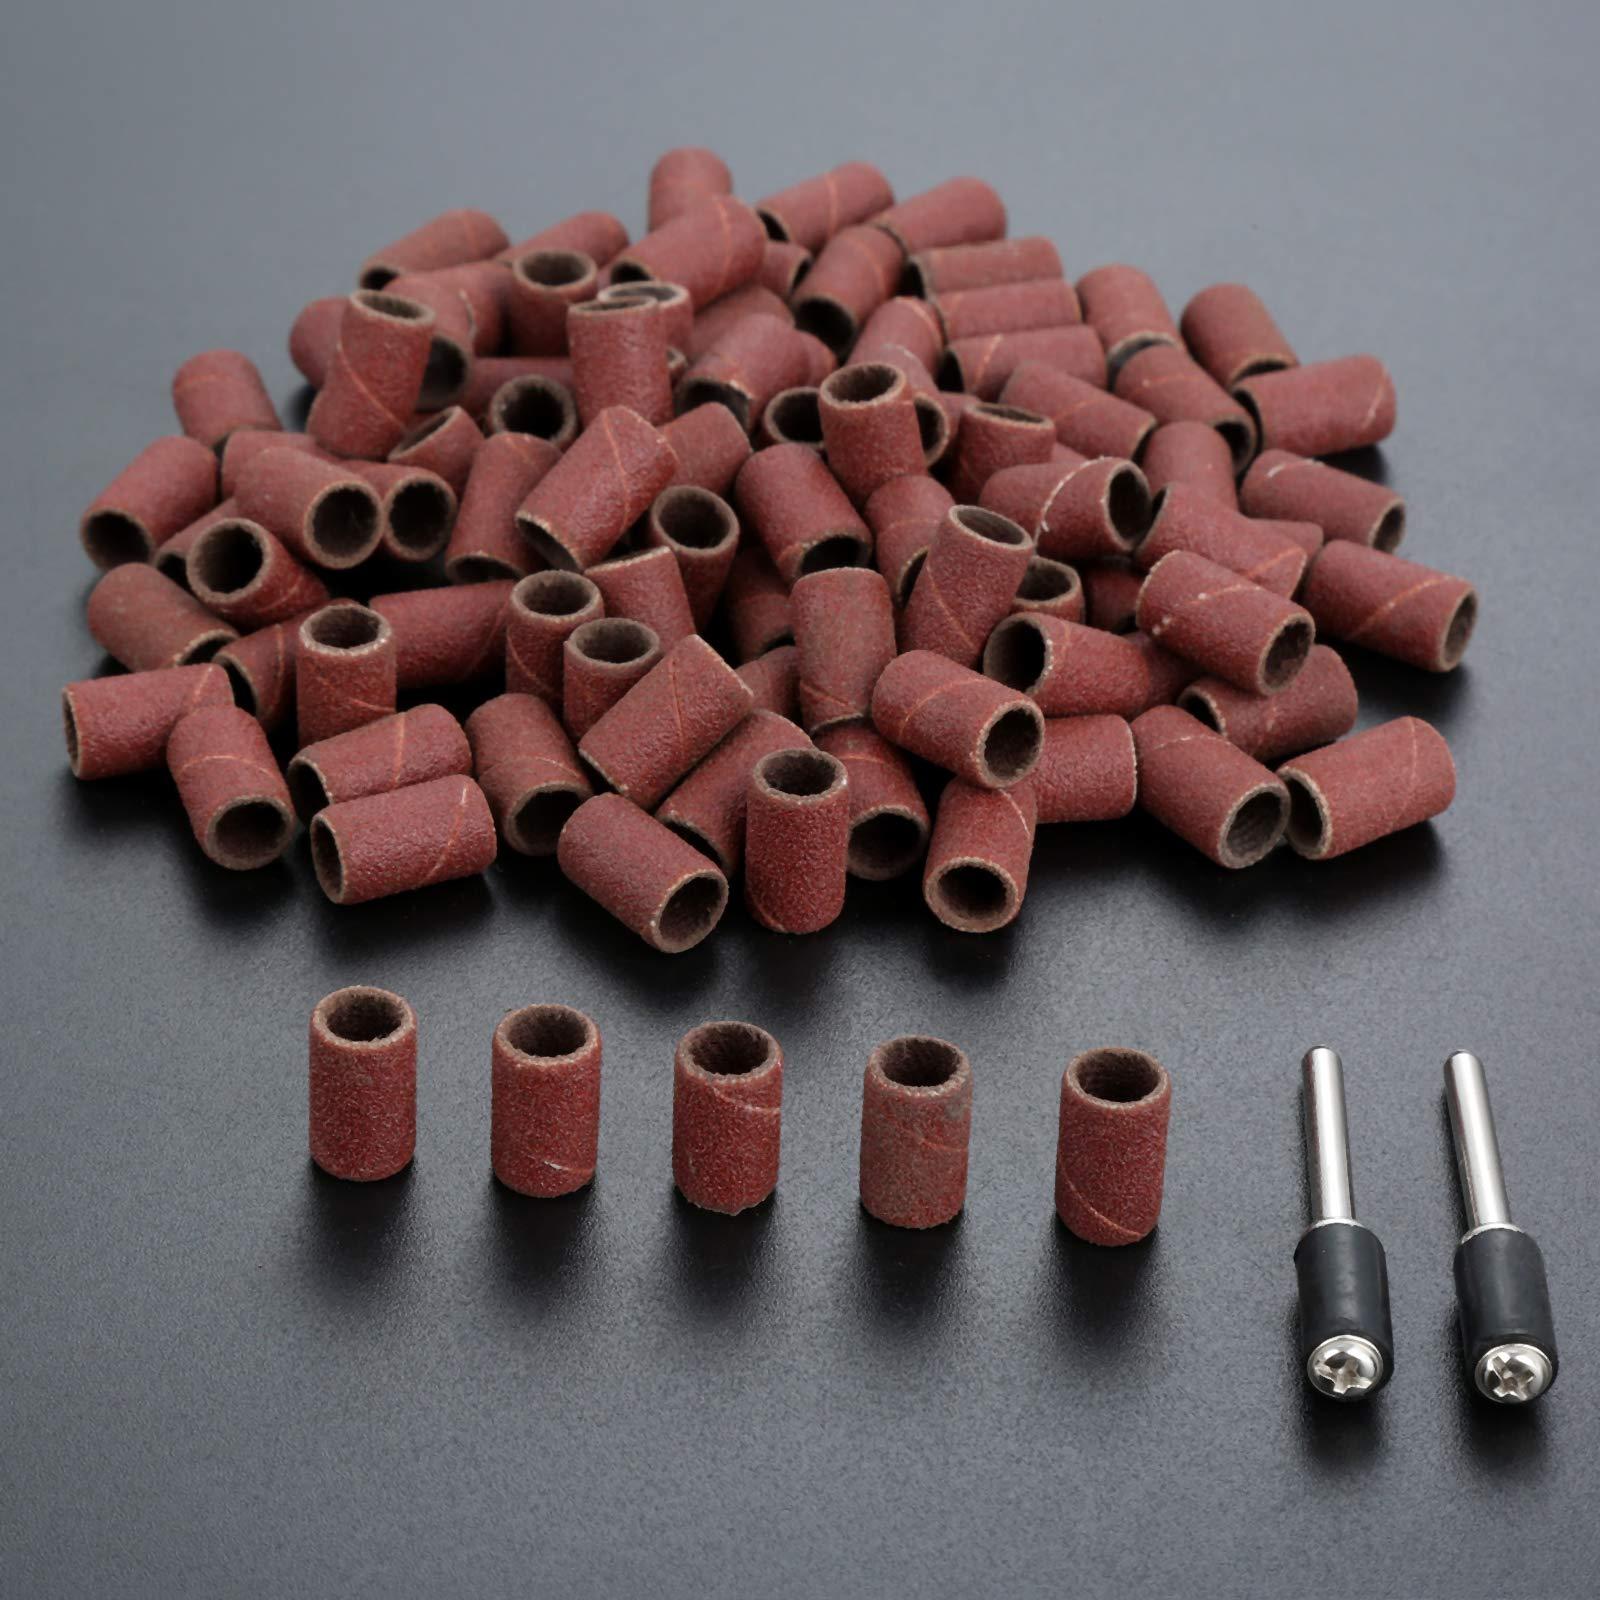 100PCs Polishing Brush Wheel for Drill Grinding Burnish Grinder Rotary Tools with 2PCs Mandrel 6.35CM Grit:180#